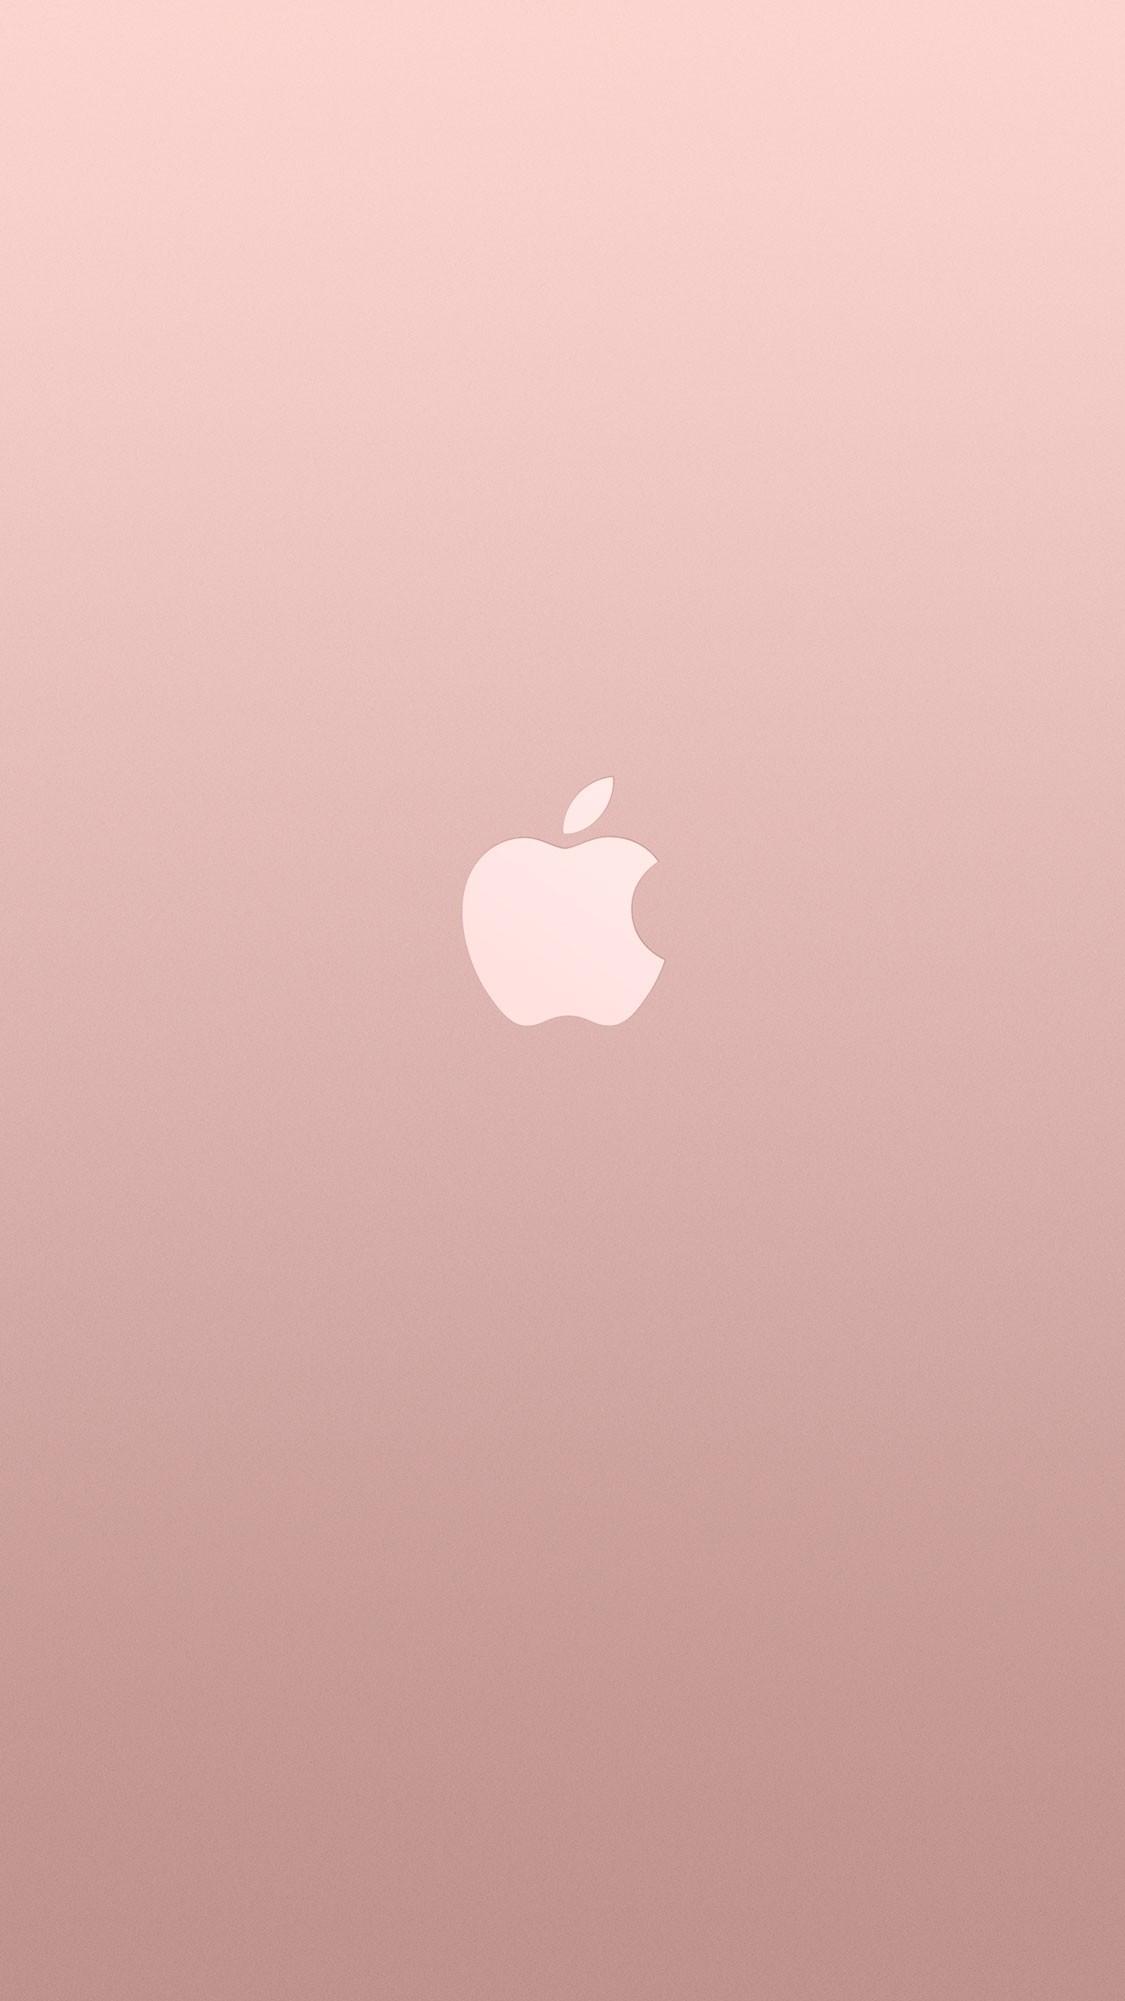 … 01_e85a705f7adf79e68b65a2f300e17c8b_raw Gold Iphone Wallpaper Rose Gold  Apple iPhone 6s wallpaper …